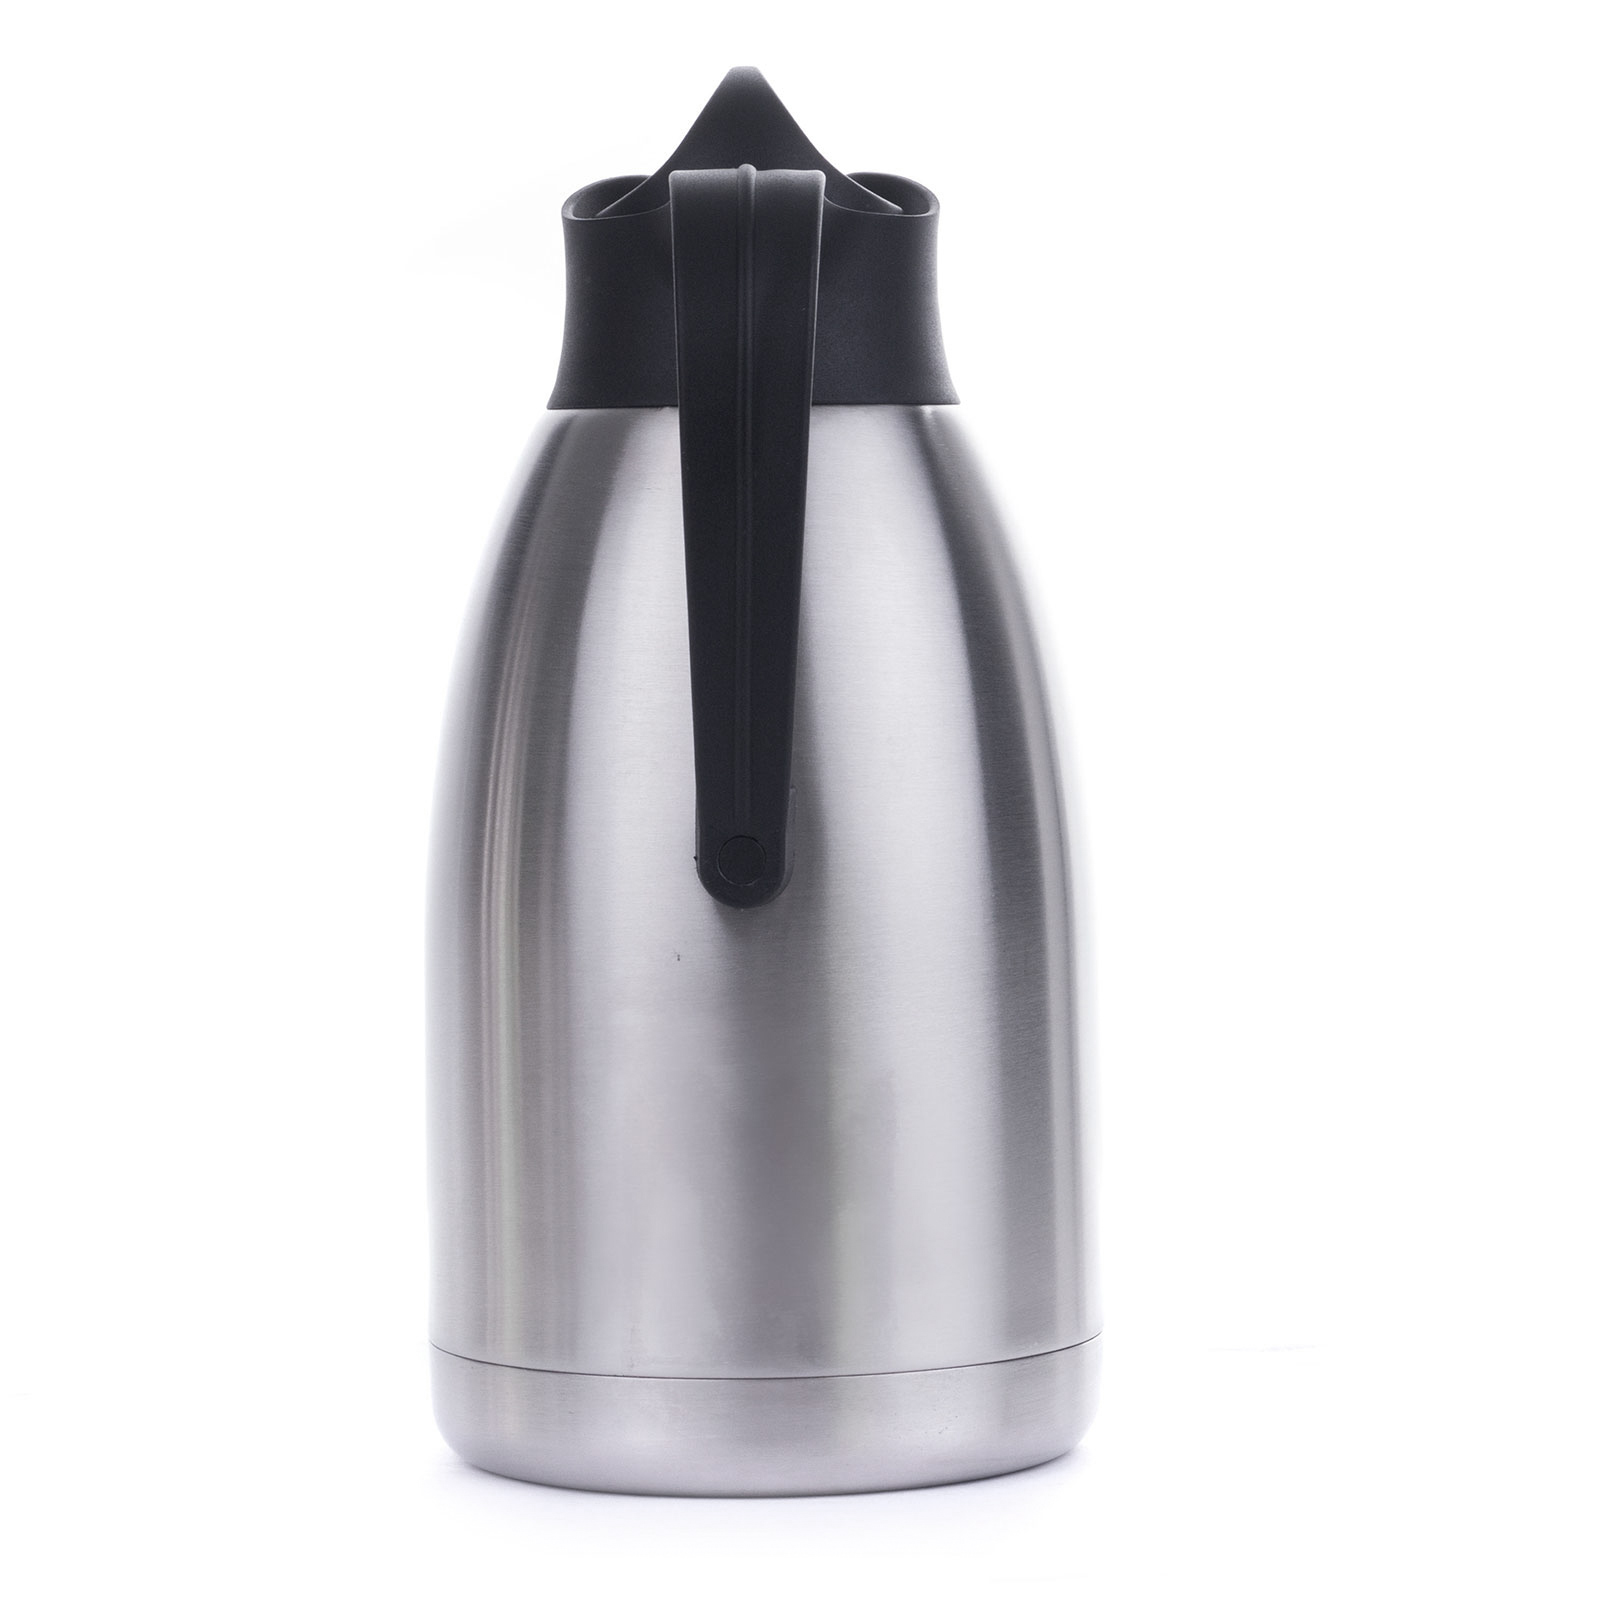 isolierkanne 2l isolierflasche thermo kanne kaffeekanne flasche edelstahl gro ebay. Black Bedroom Furniture Sets. Home Design Ideas